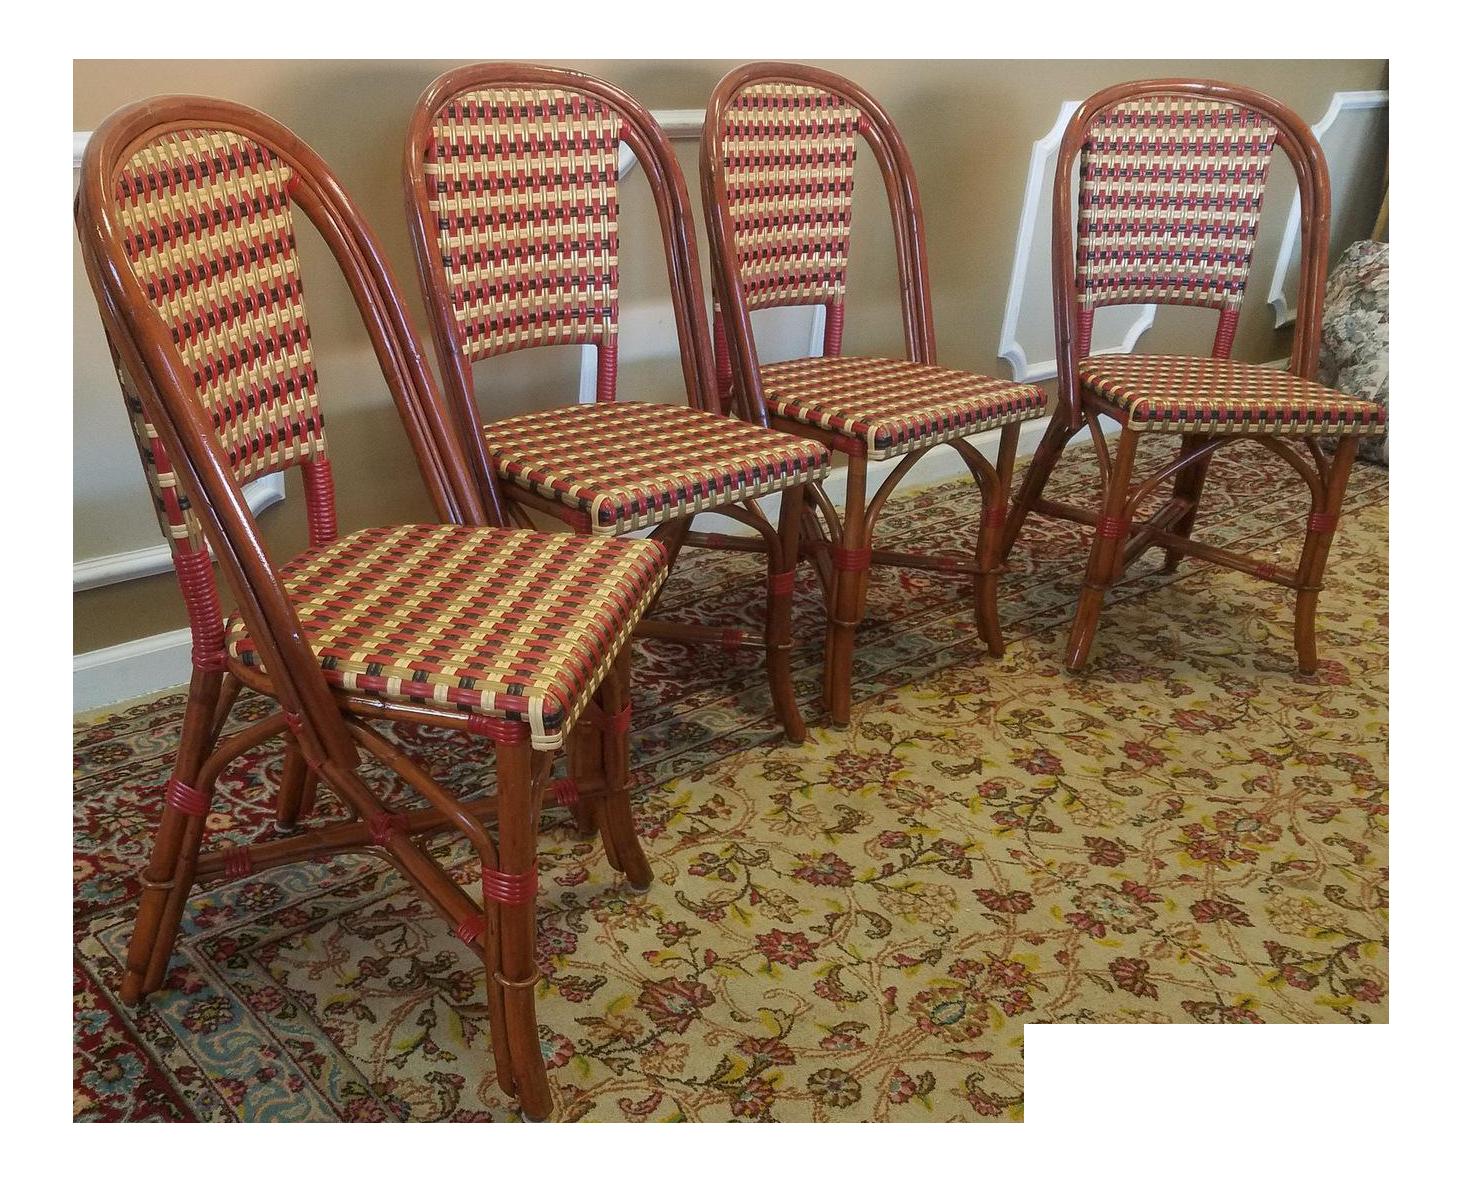 Louis cane back dining chair set of 2 ballard designs - Glac Seat Poitoux Parisian Style Caned Rattan Bistro Chairs Set